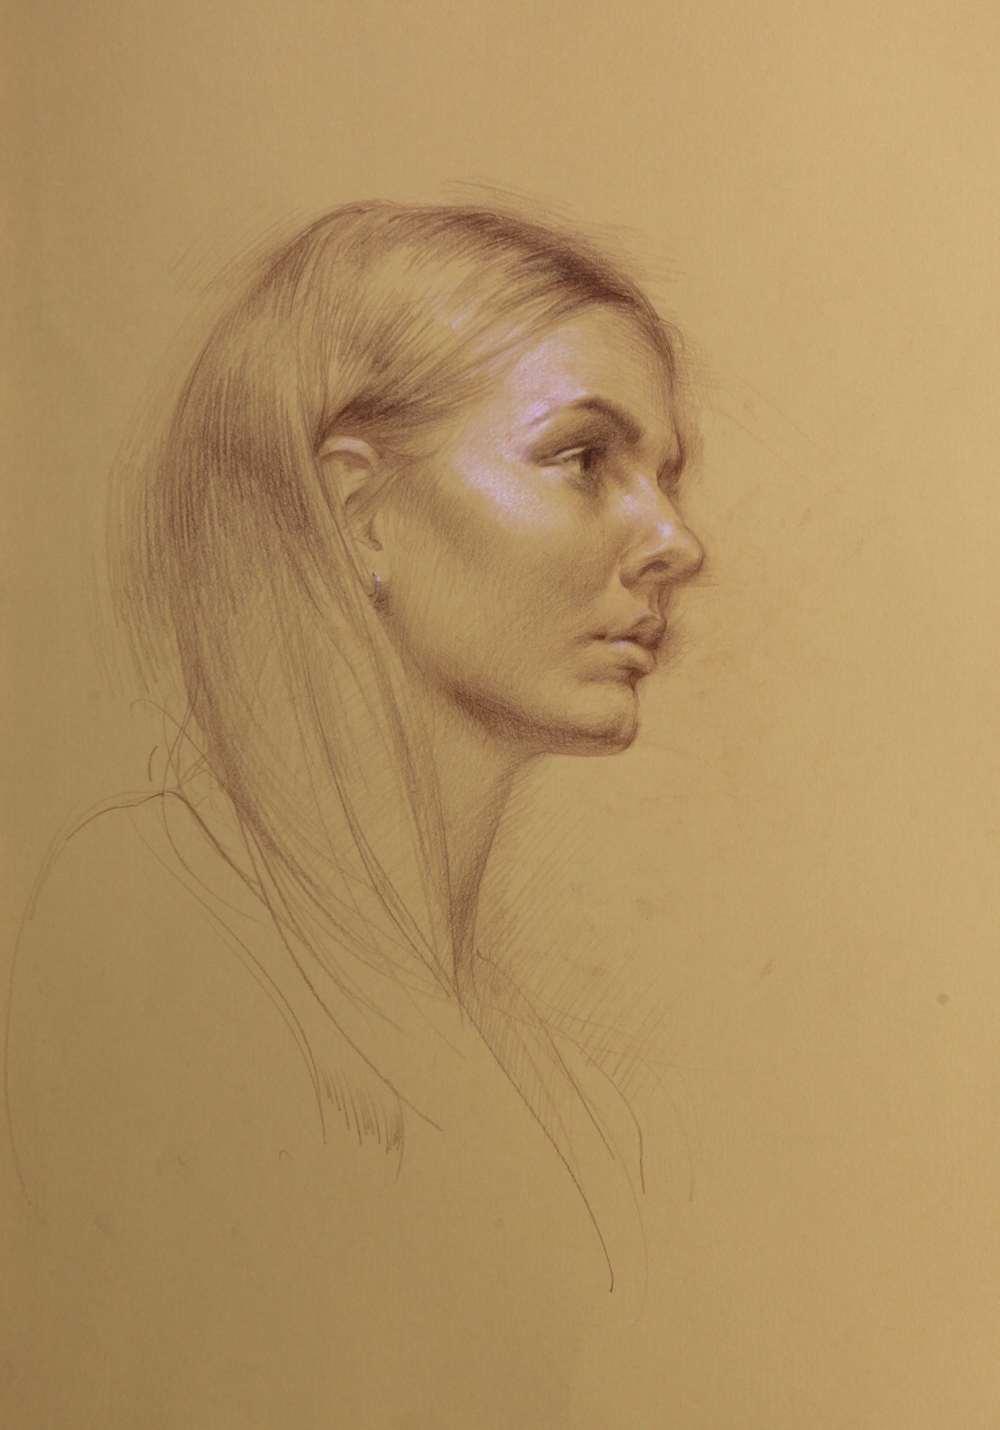 Scott+Breton+portrait+life+drawing+young+woman-1.jpg